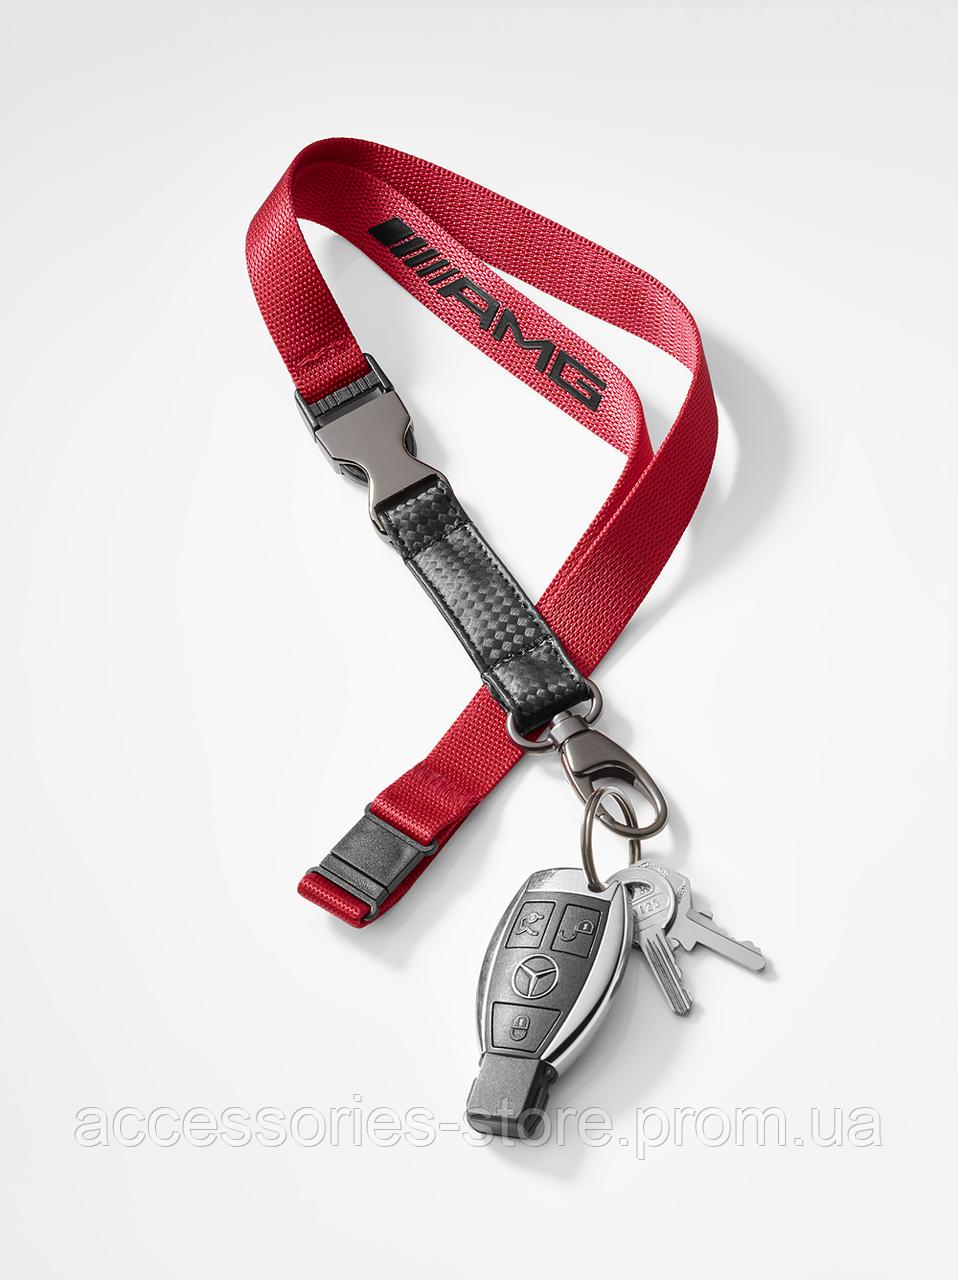 Лента с карабином для ключей Mercedes-AMG Lanyard, Red Black